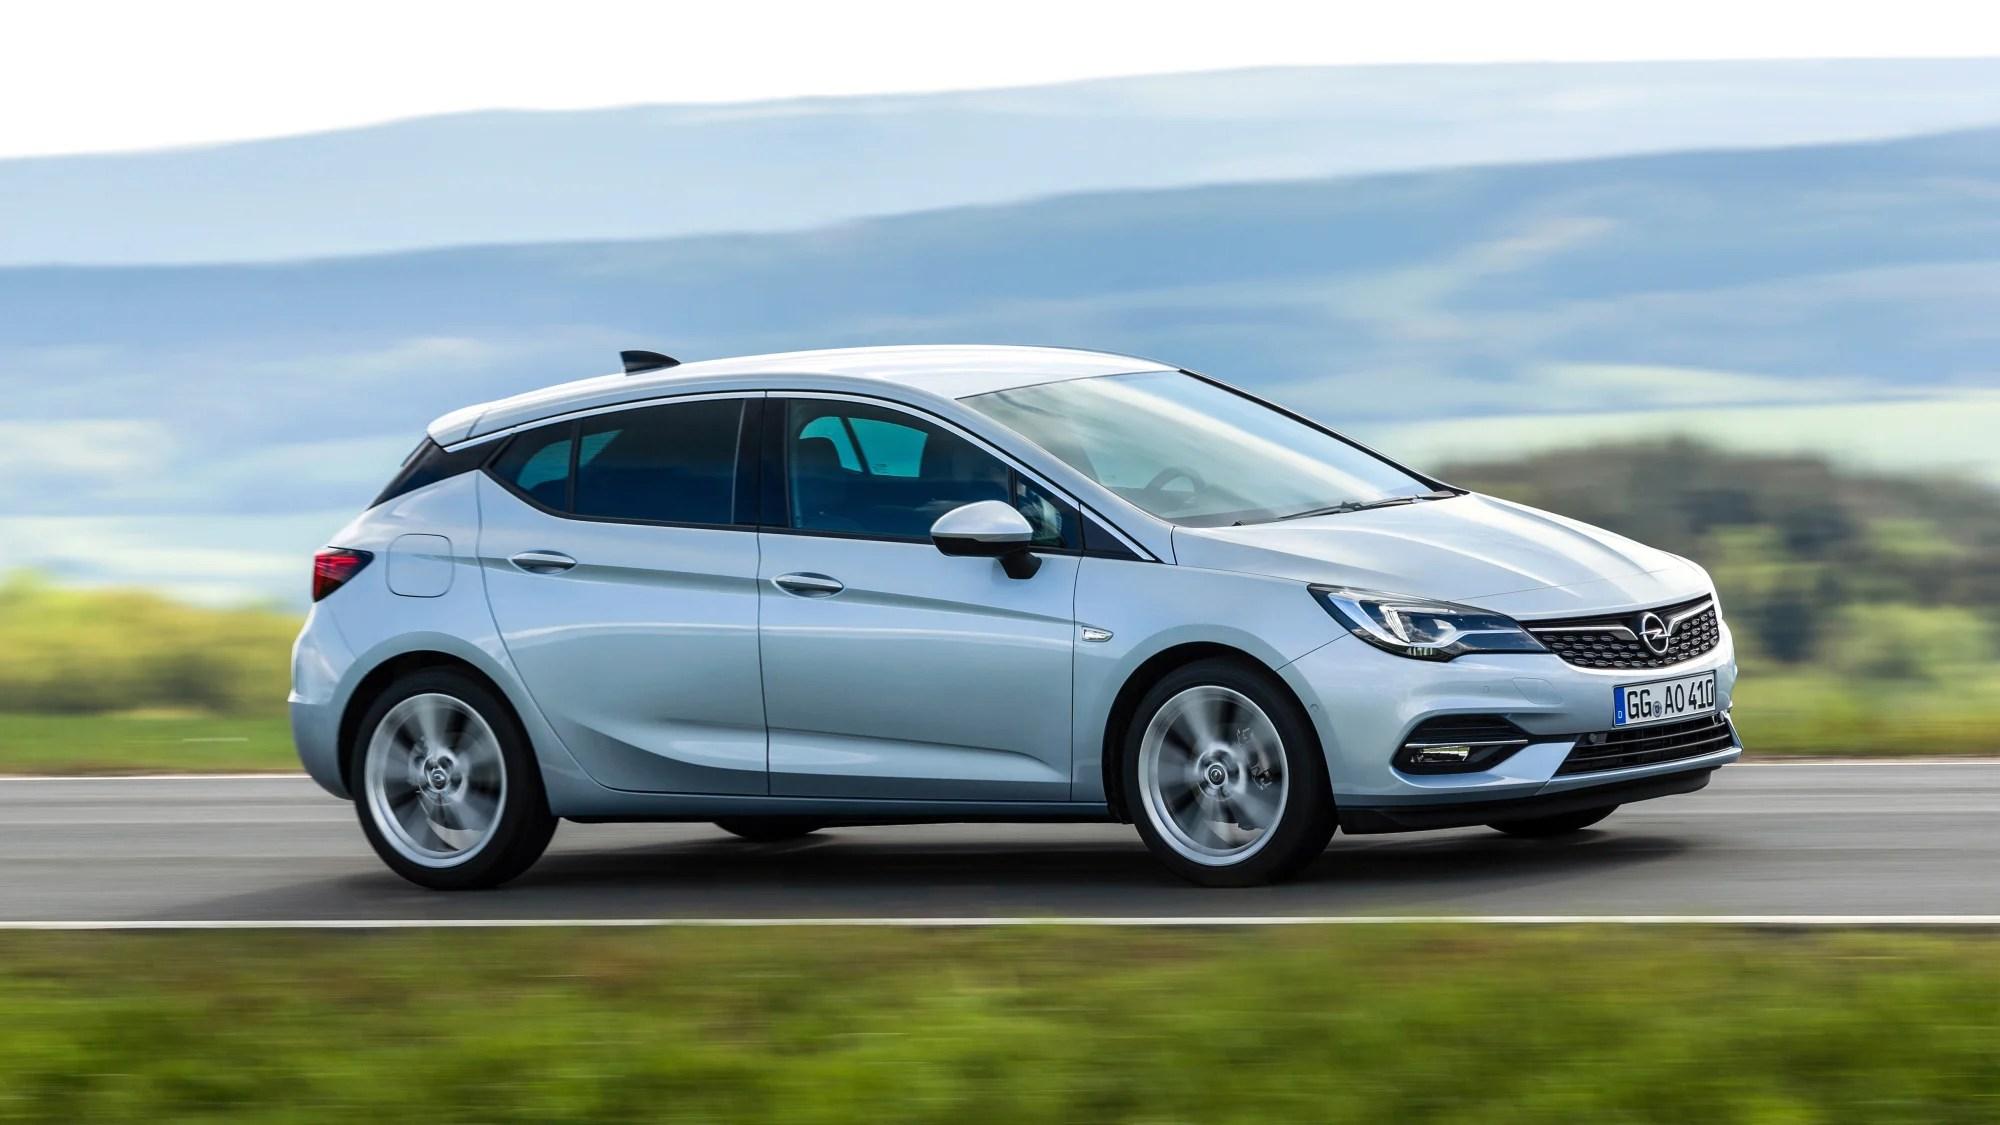 Test Opel Astra K Das Kann Das Facelift Modell Motoren Preise Adac